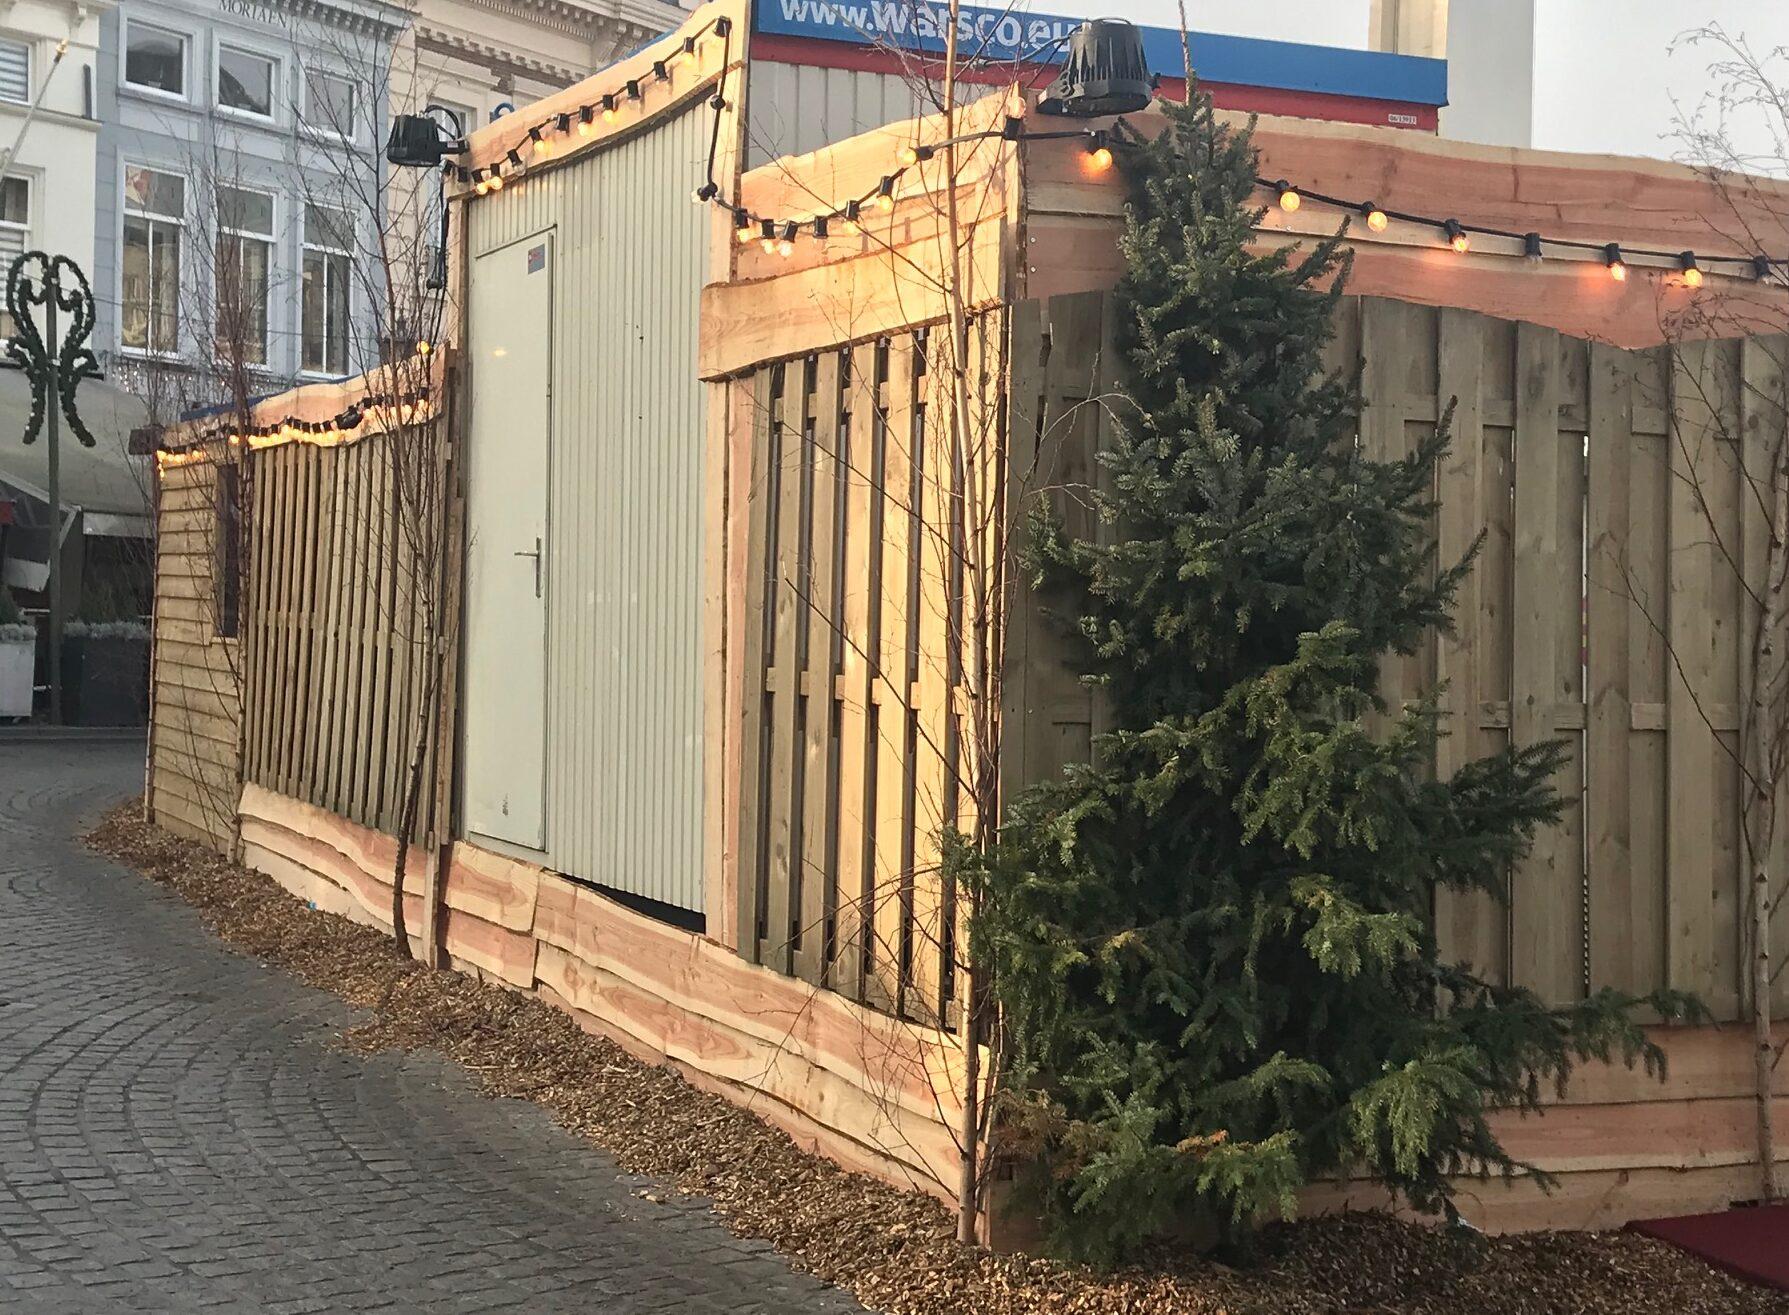 kerstboom kerst grote markt denneboom